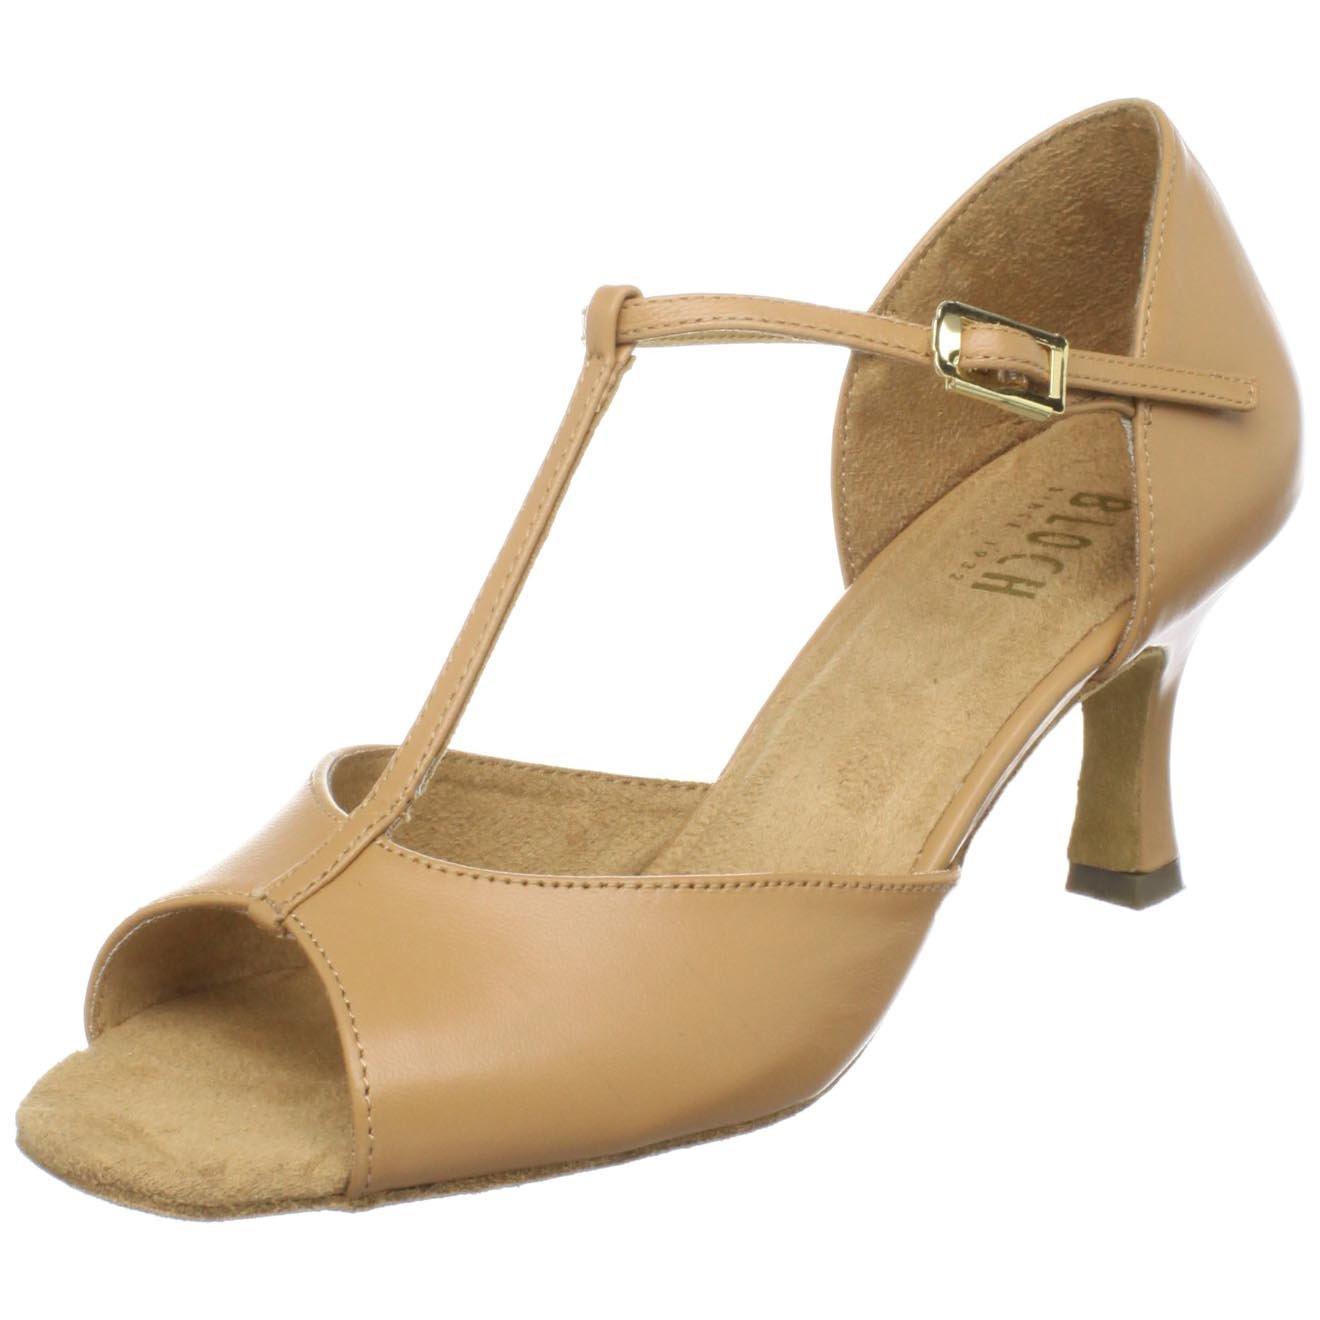 Bloch Women's Issabella Ballroom Shoe,Natural,7.5 M US